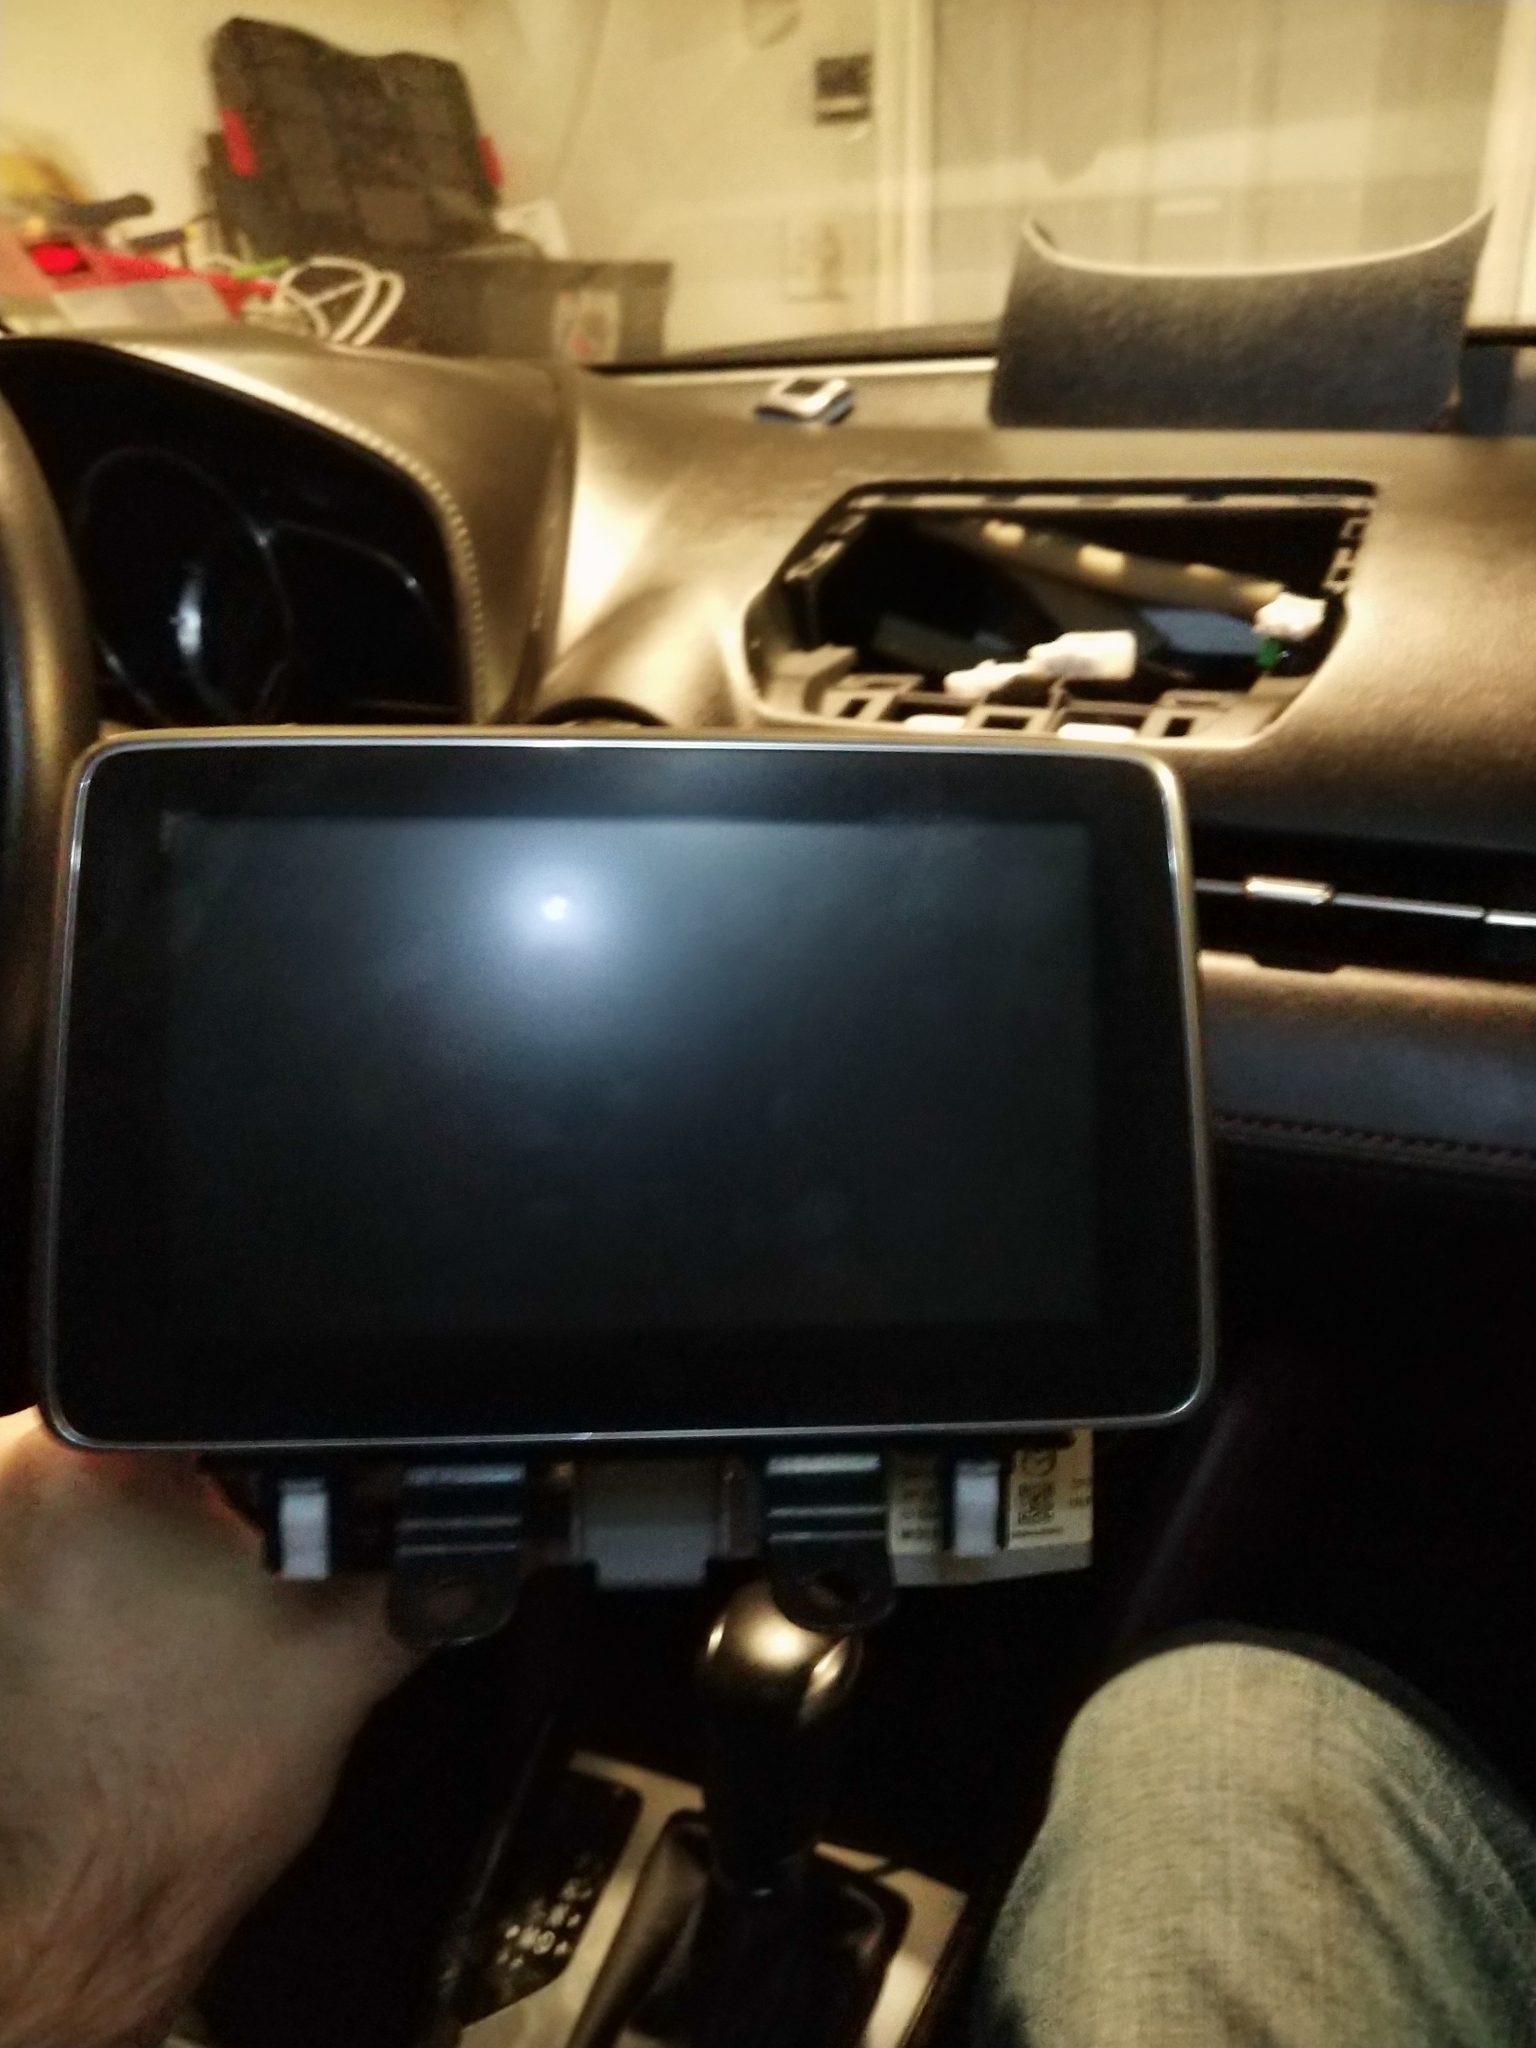 Installing Android Auto / Apple Carplay retrofit in Mazda